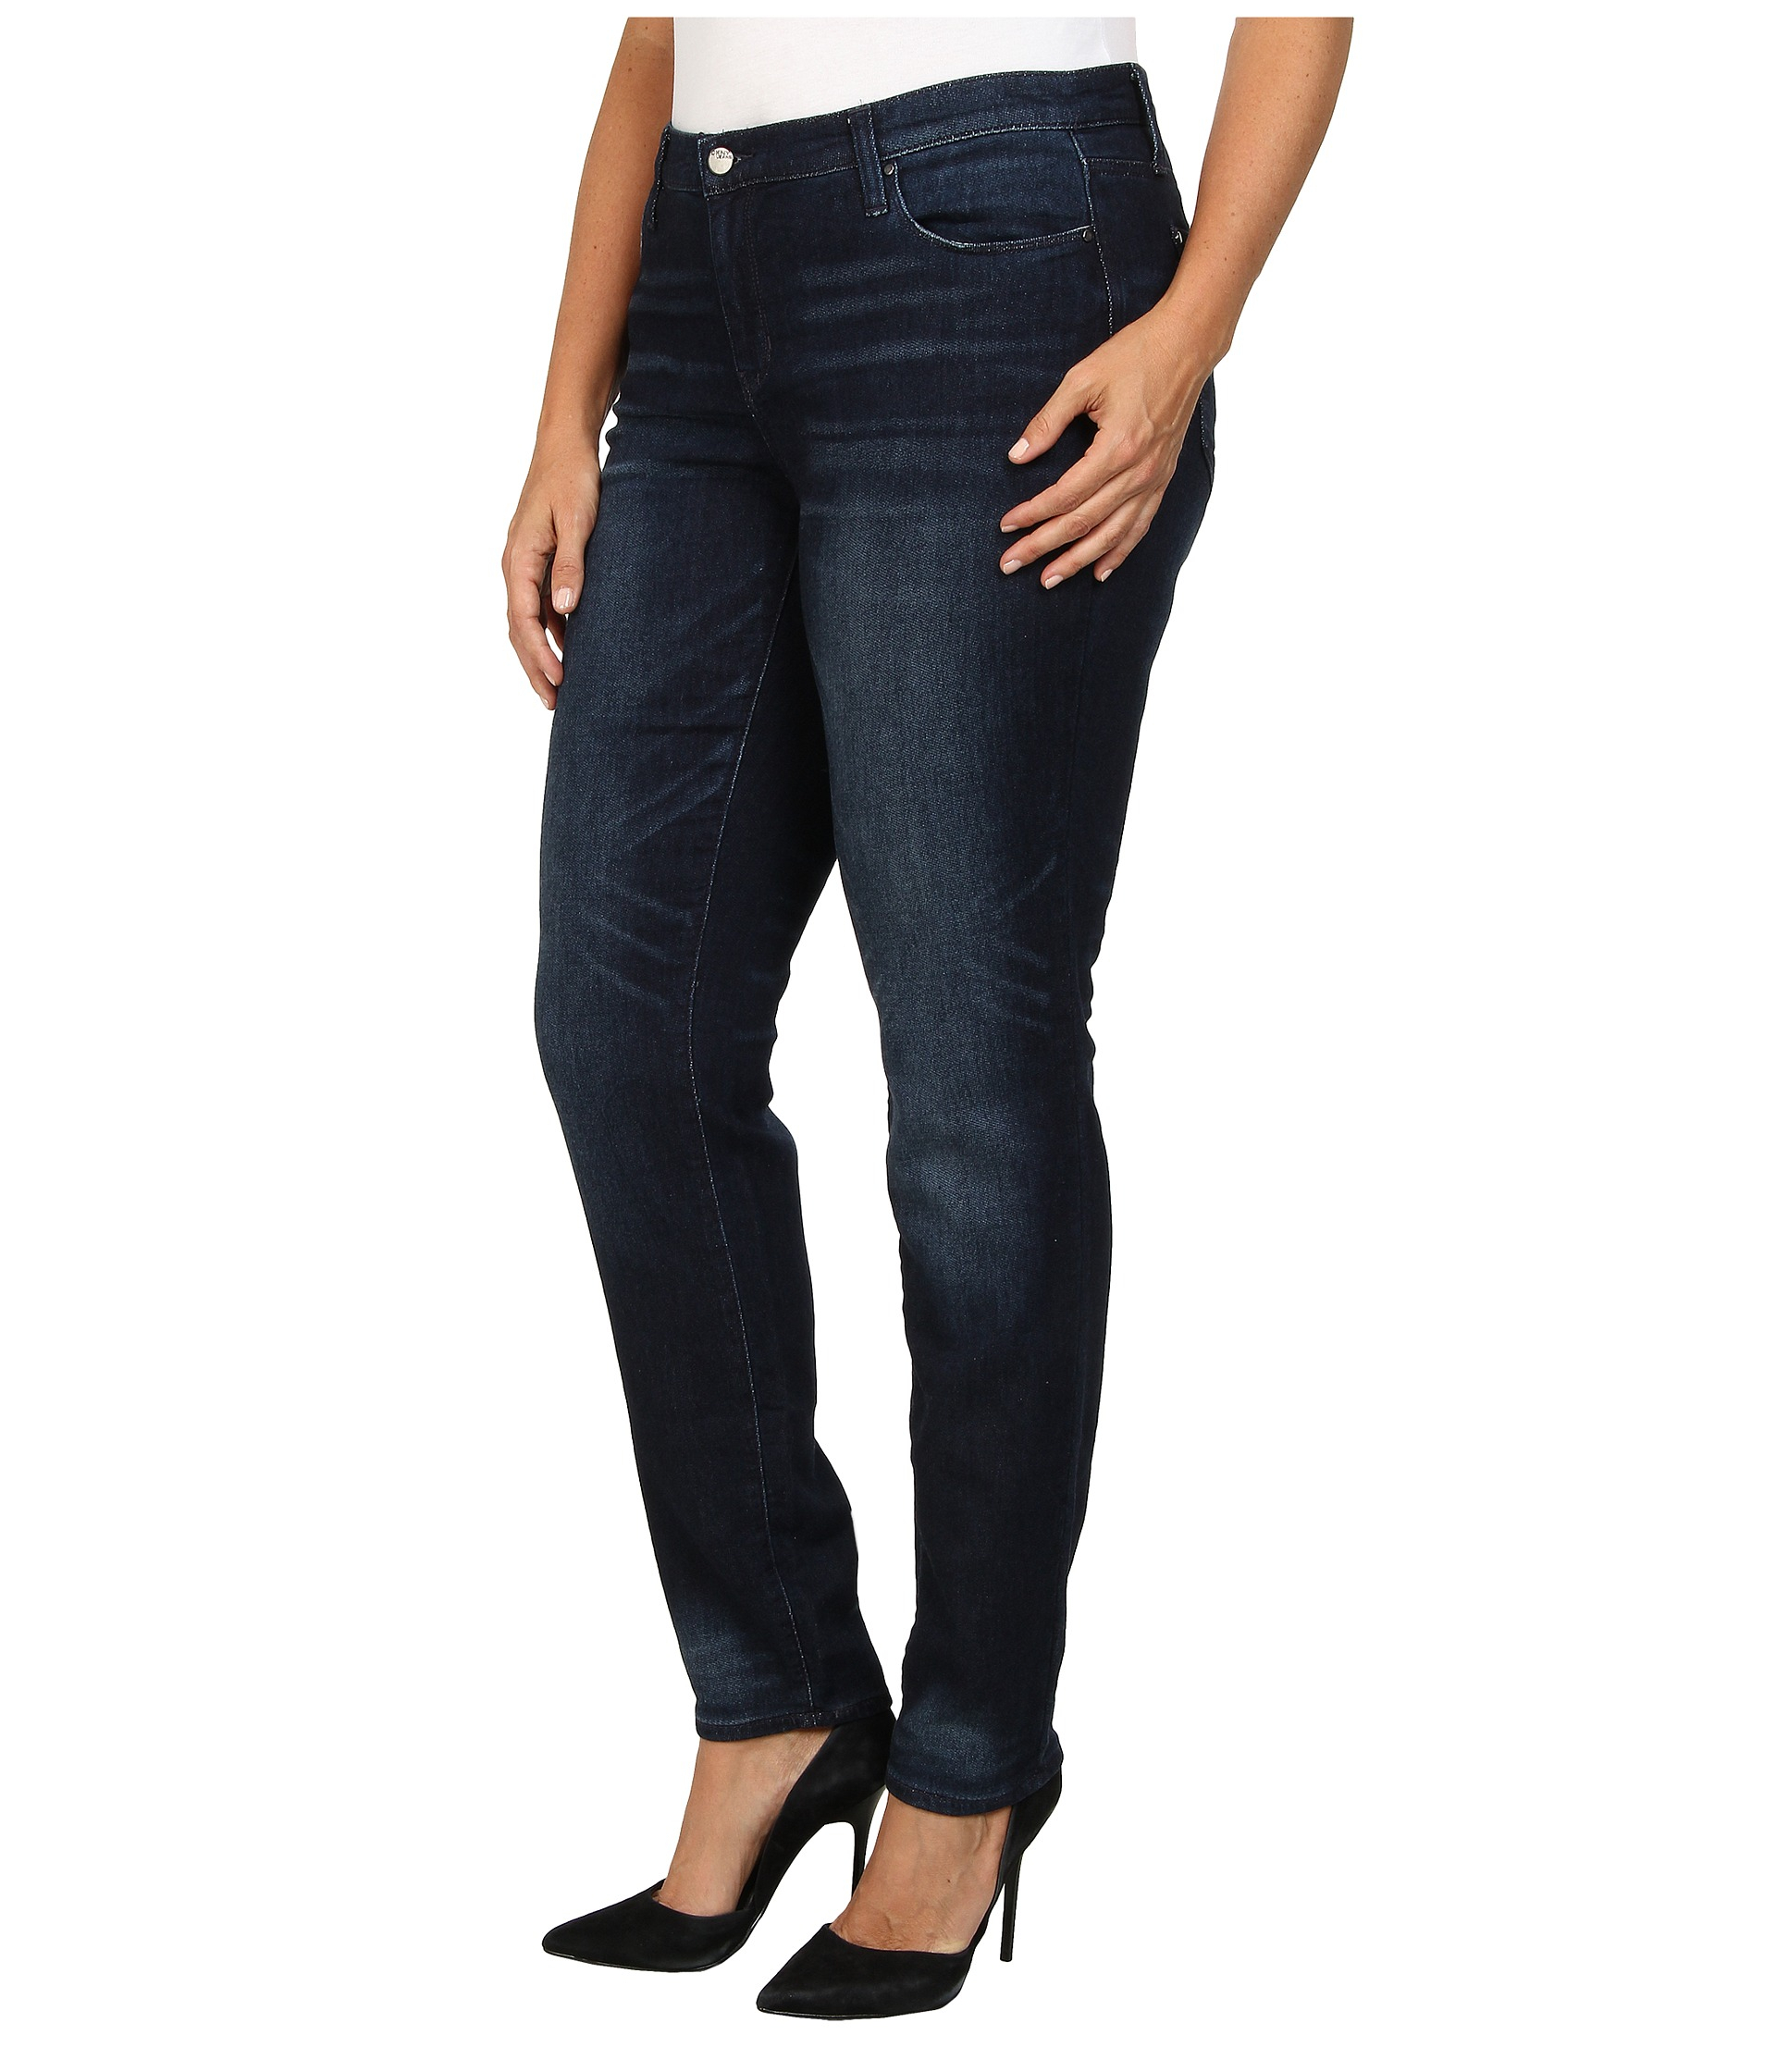 71954c0f7ccaa Lyst - DKNY Plus Size Soho Skinny Knit Denim In Kinetic Wash in Blue